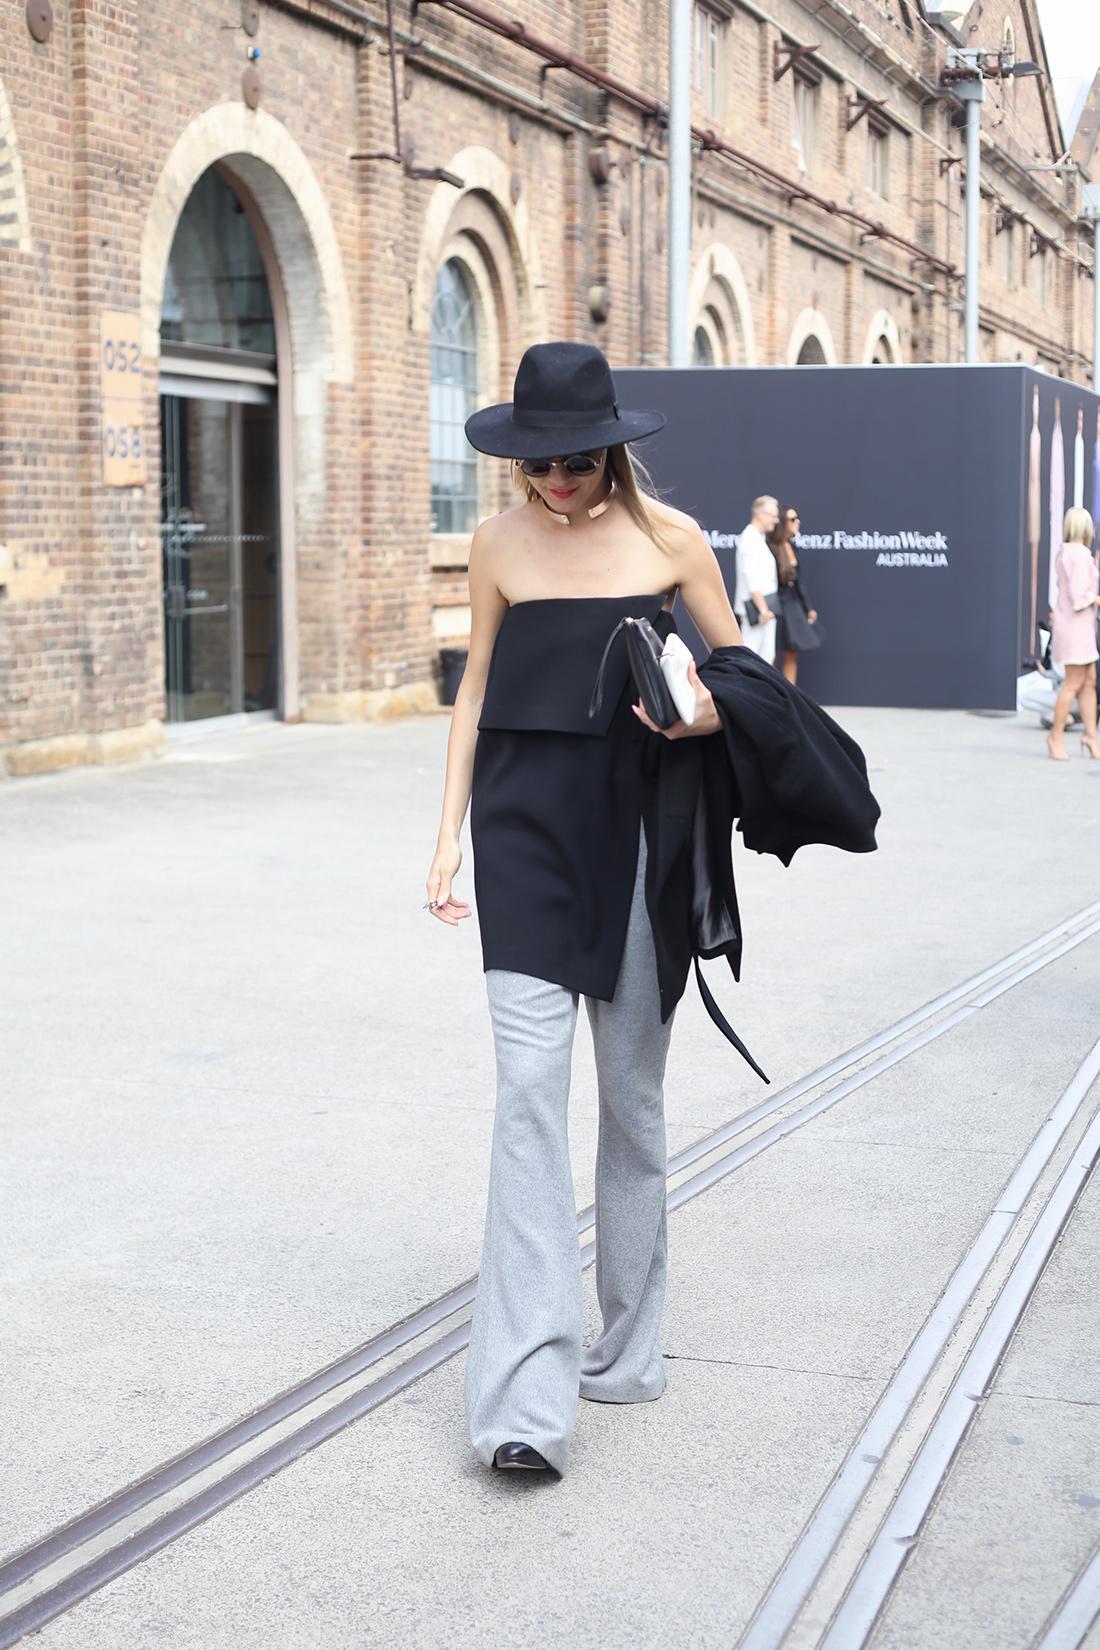 streetstyle mbfwa sydney australia fashion week